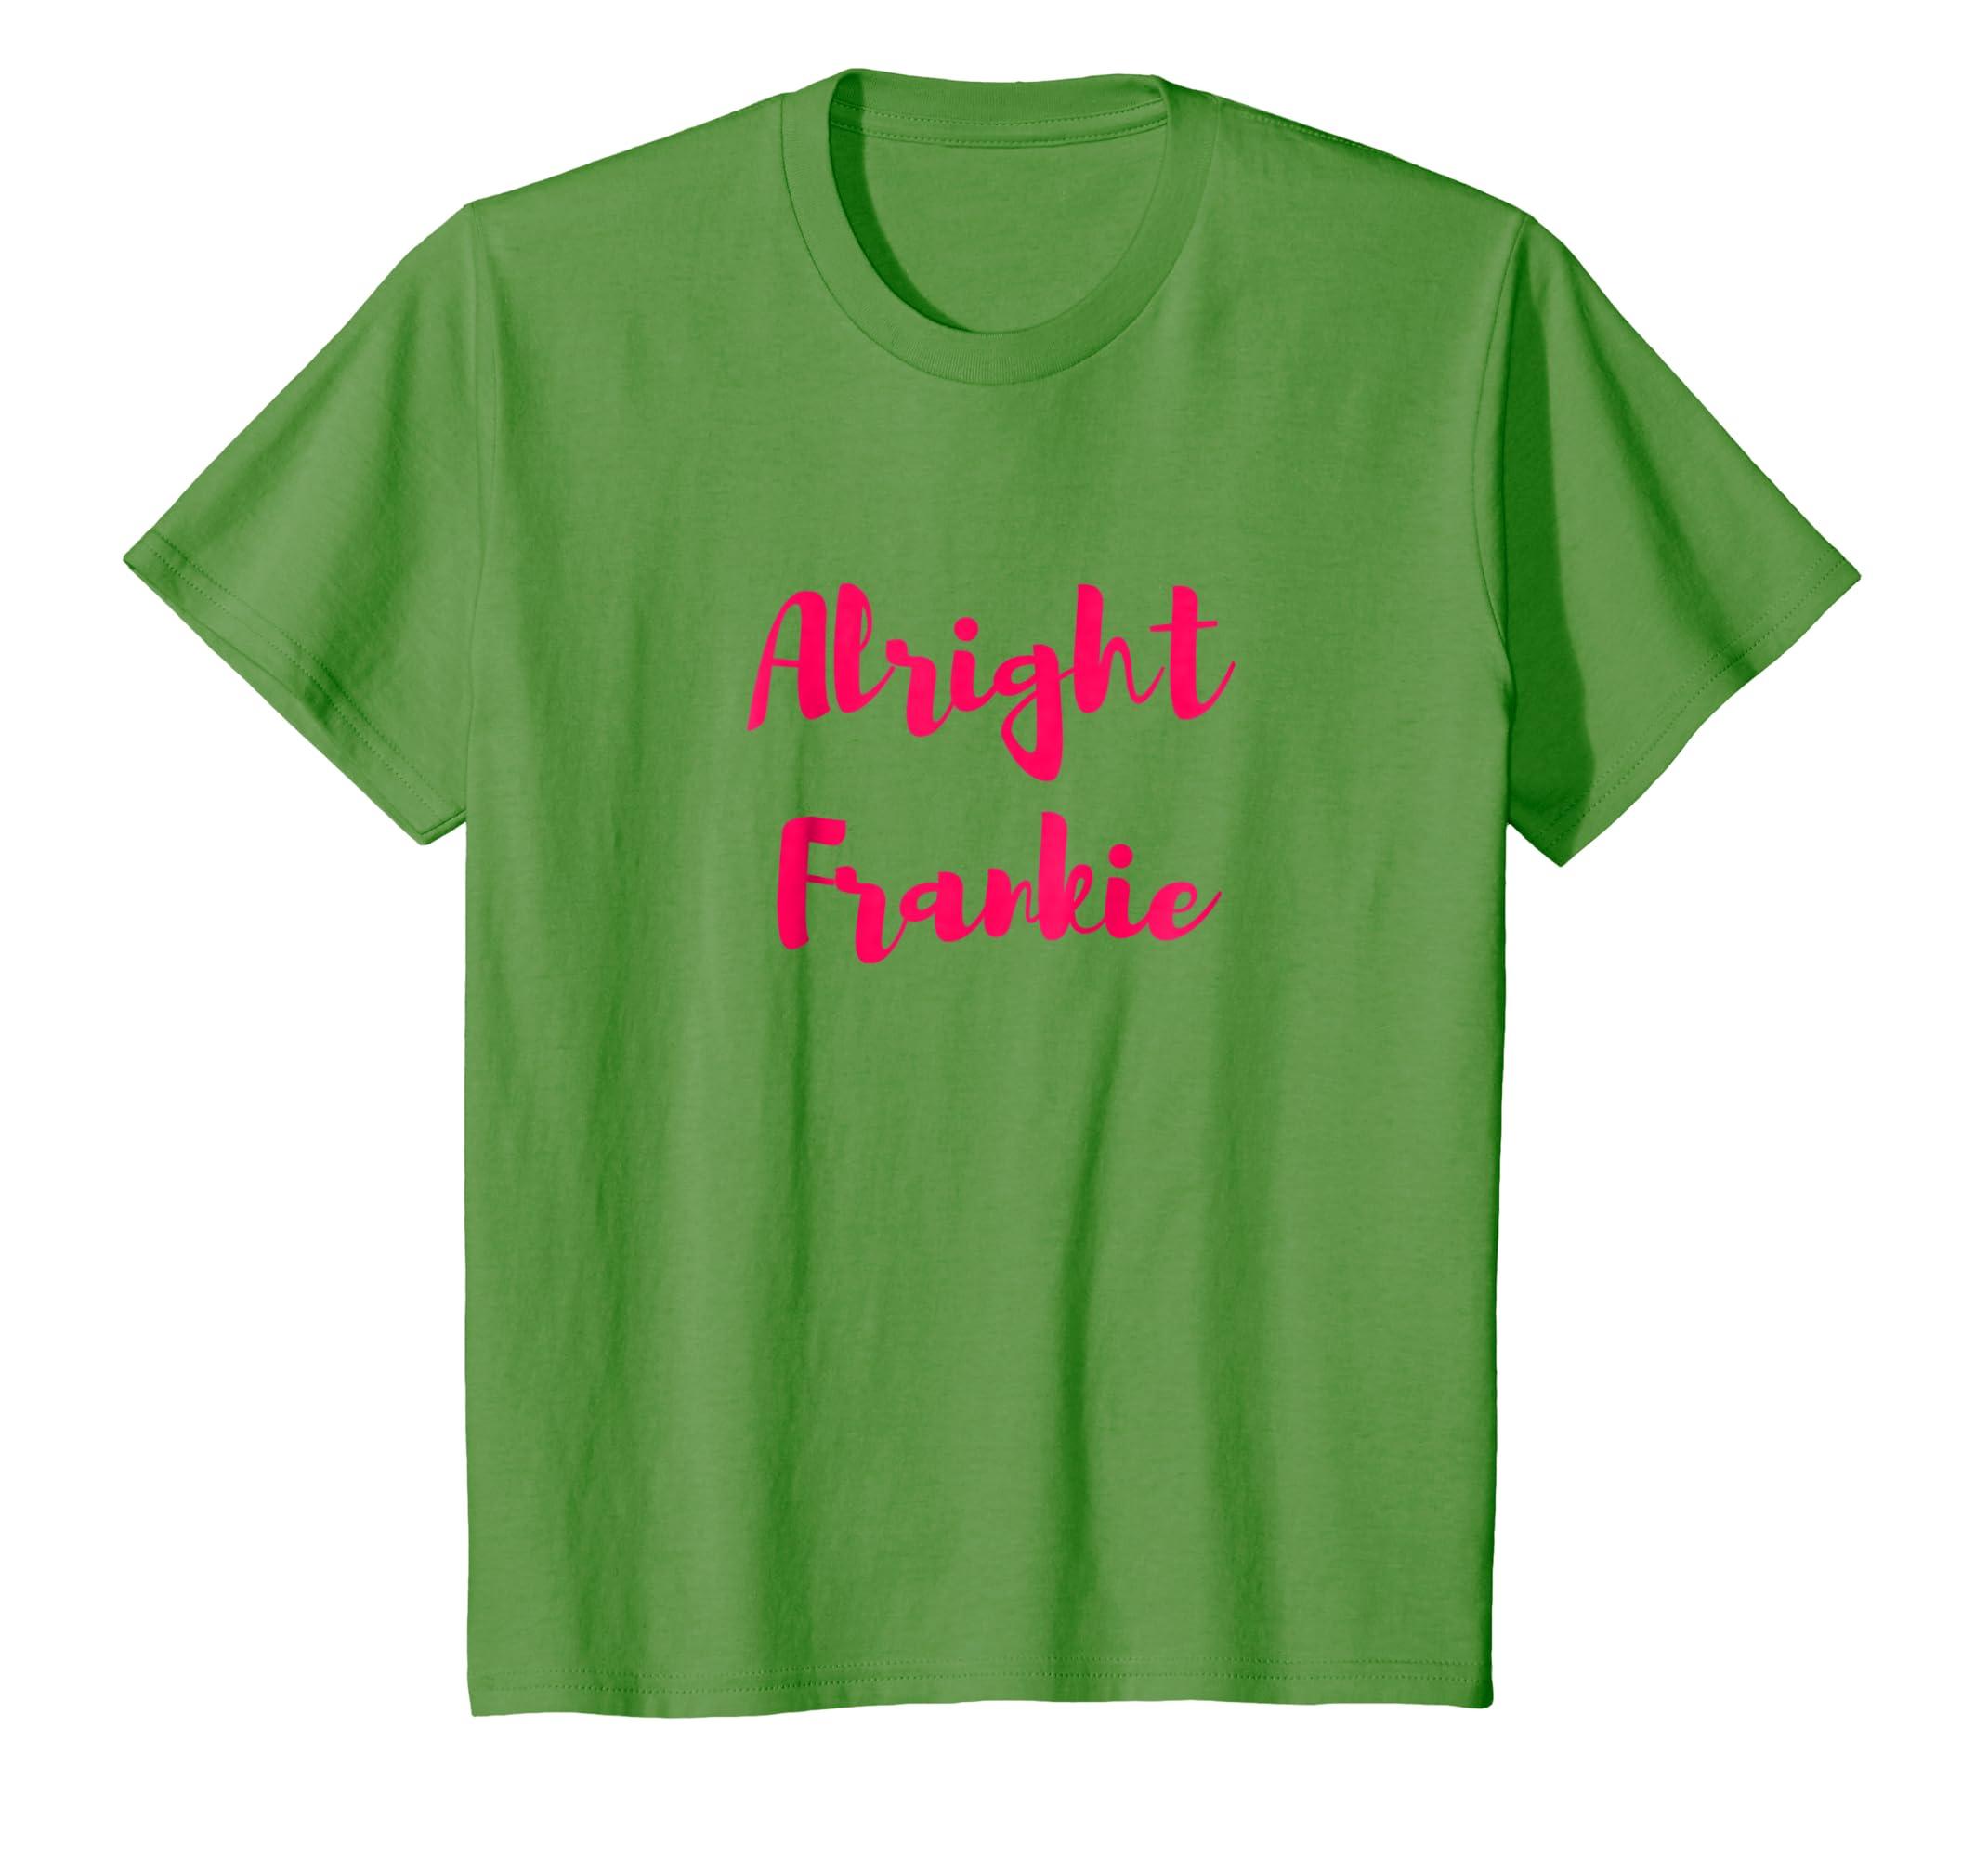 Alright Frankie t shirt